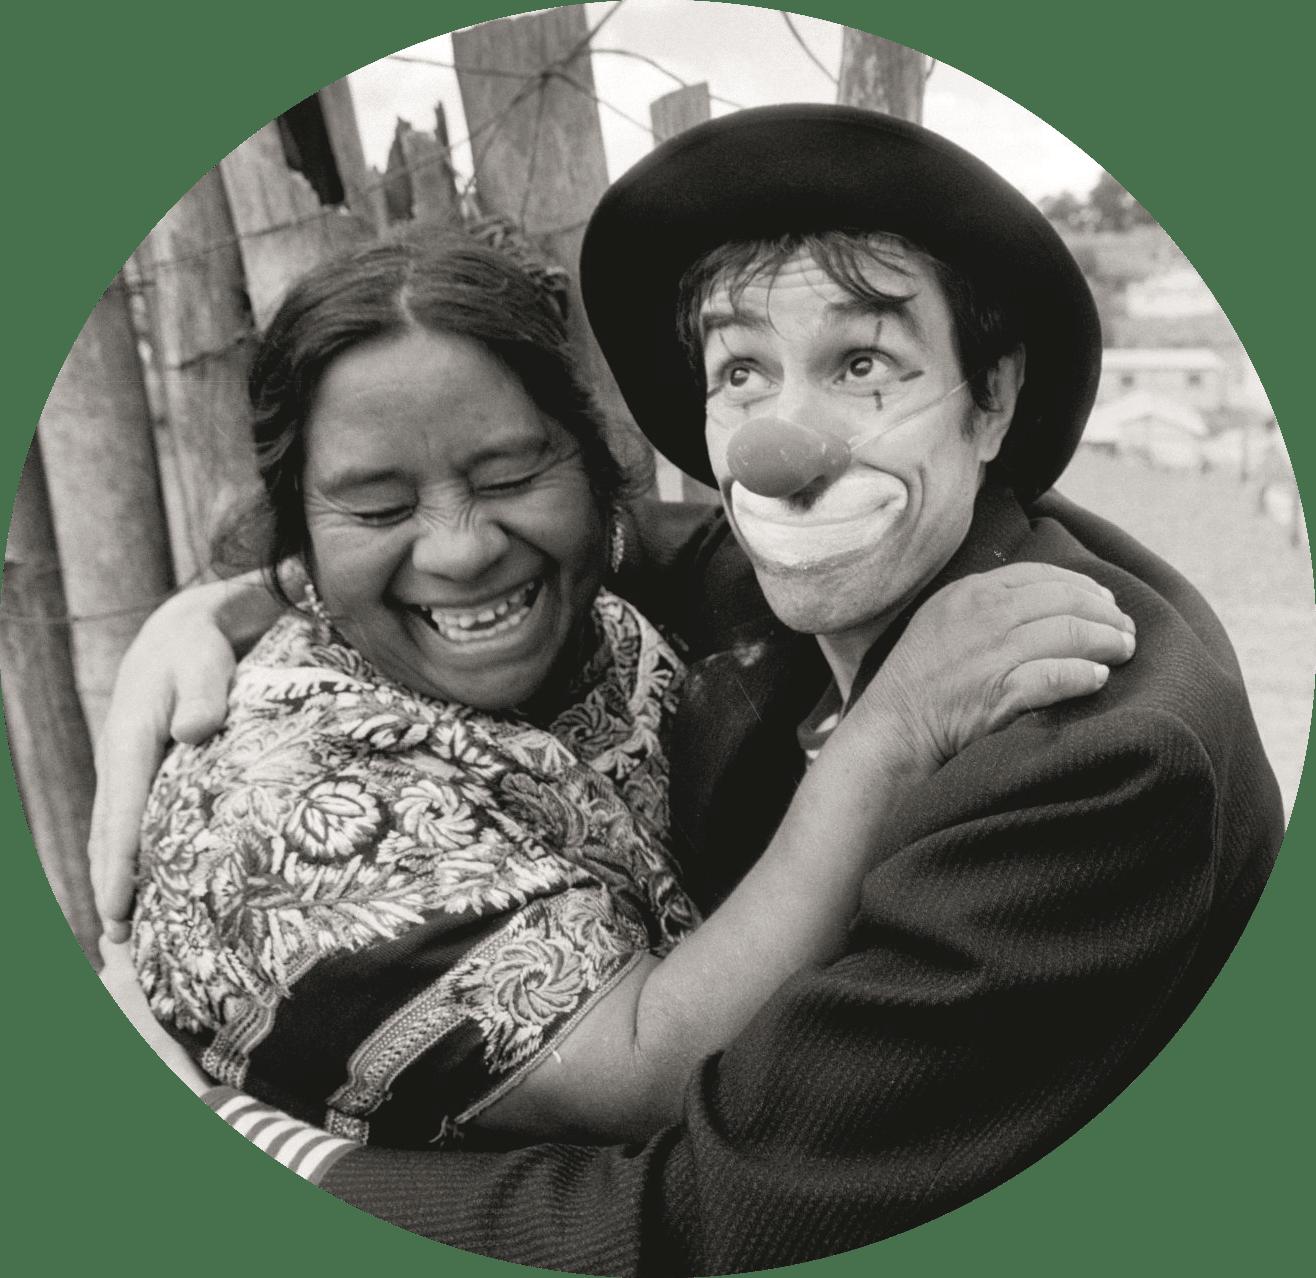 Payasos Sin Fronteras portrait